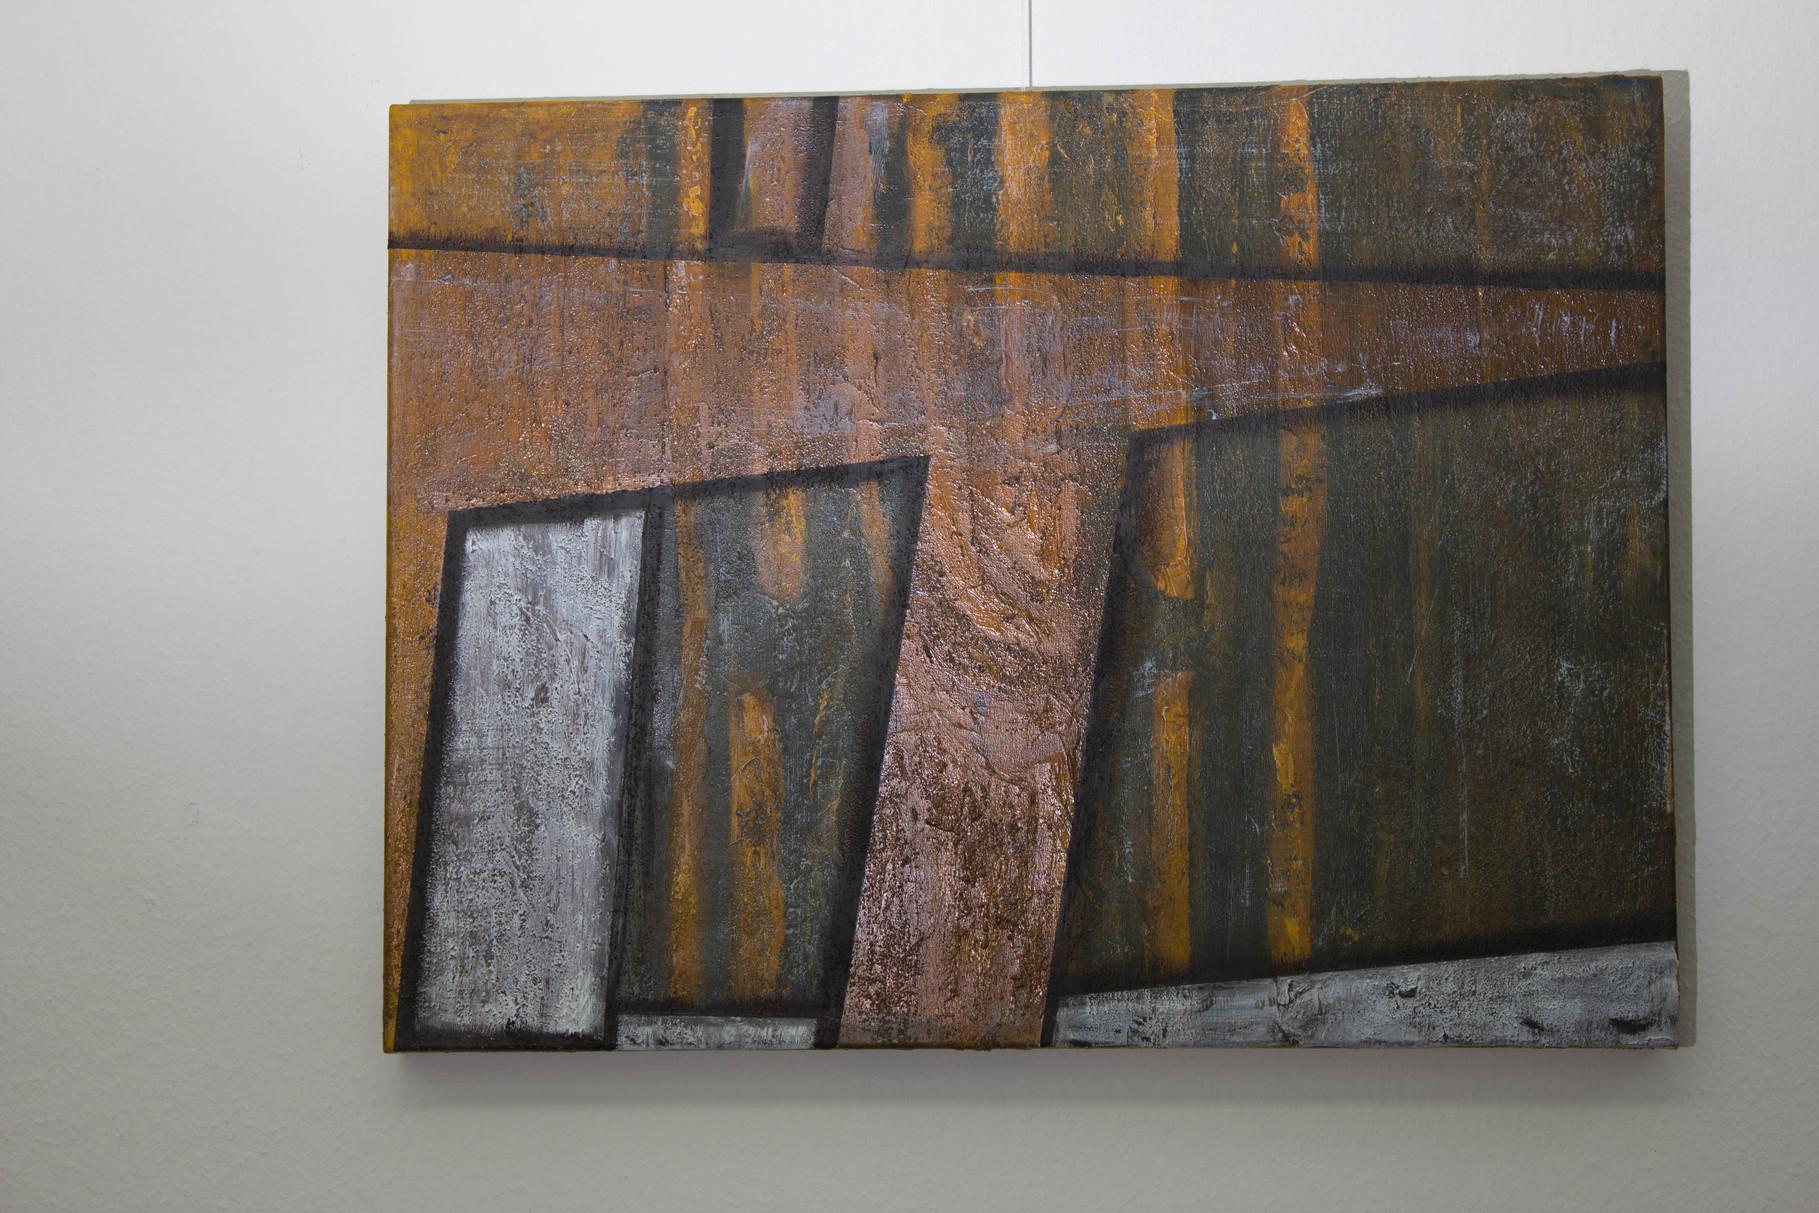 Nr. 17 Dietmar Krause, Acryl auf Leinwand